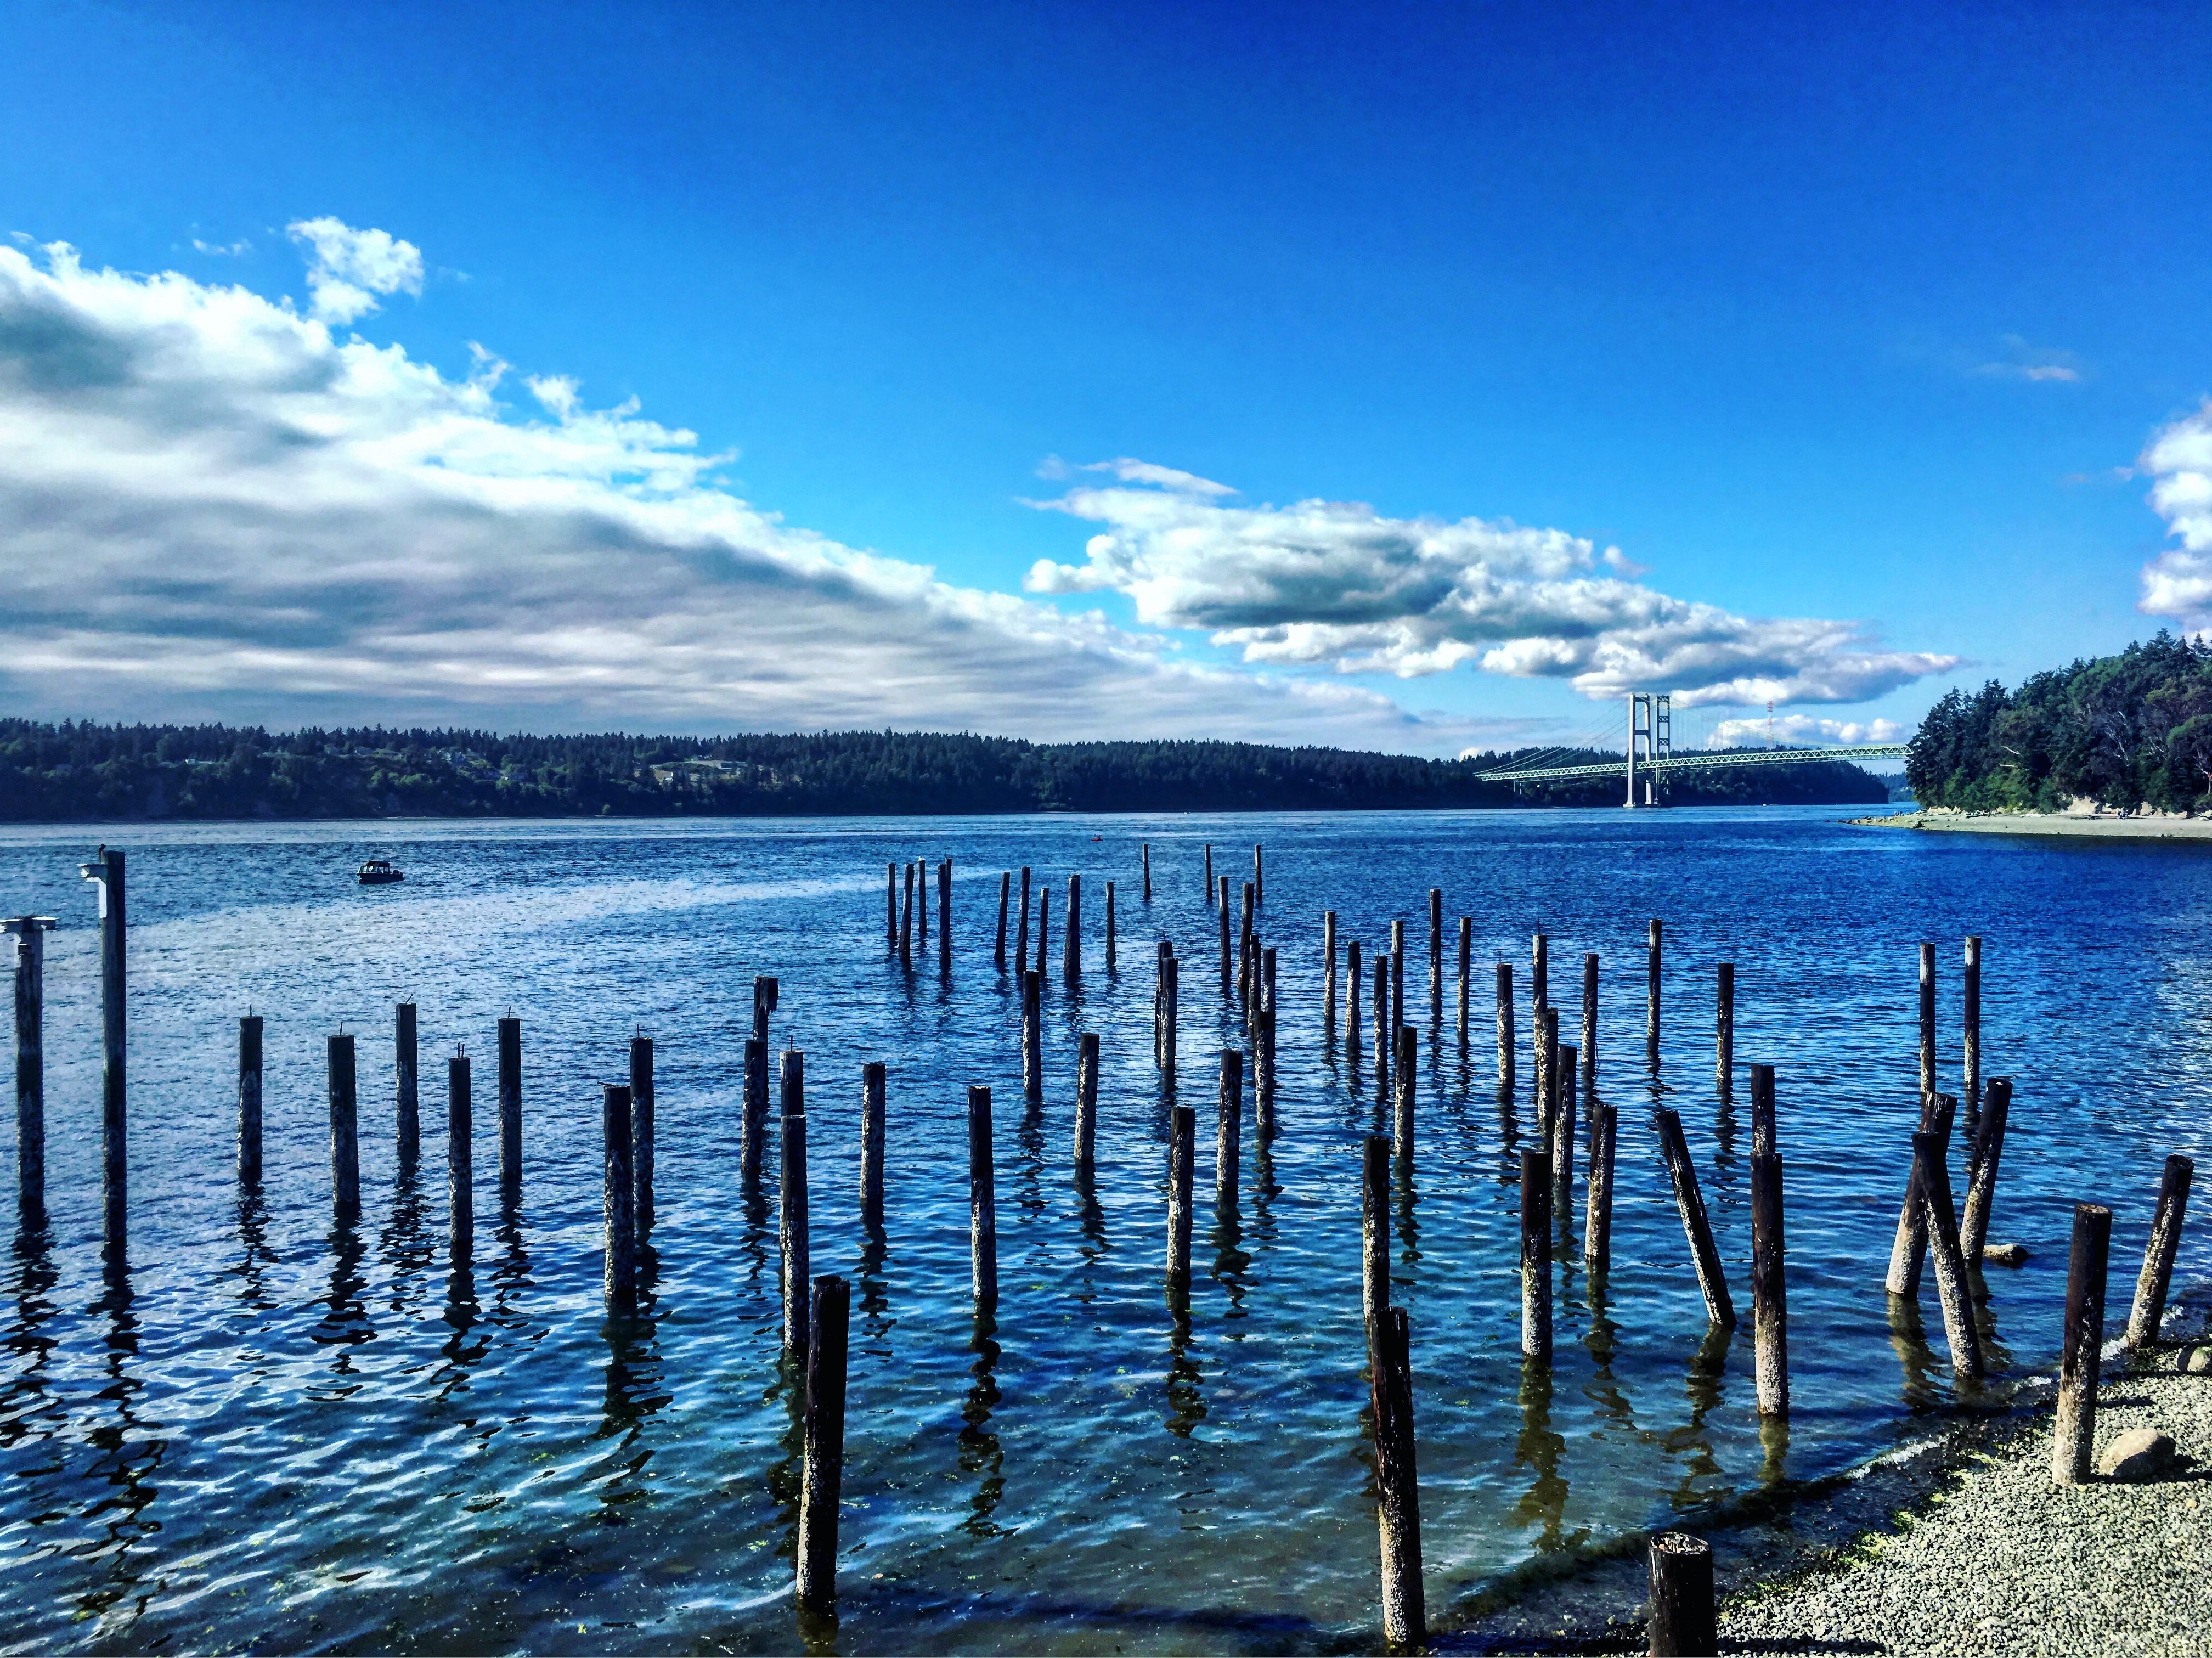 Narrows bridge in Tacoma